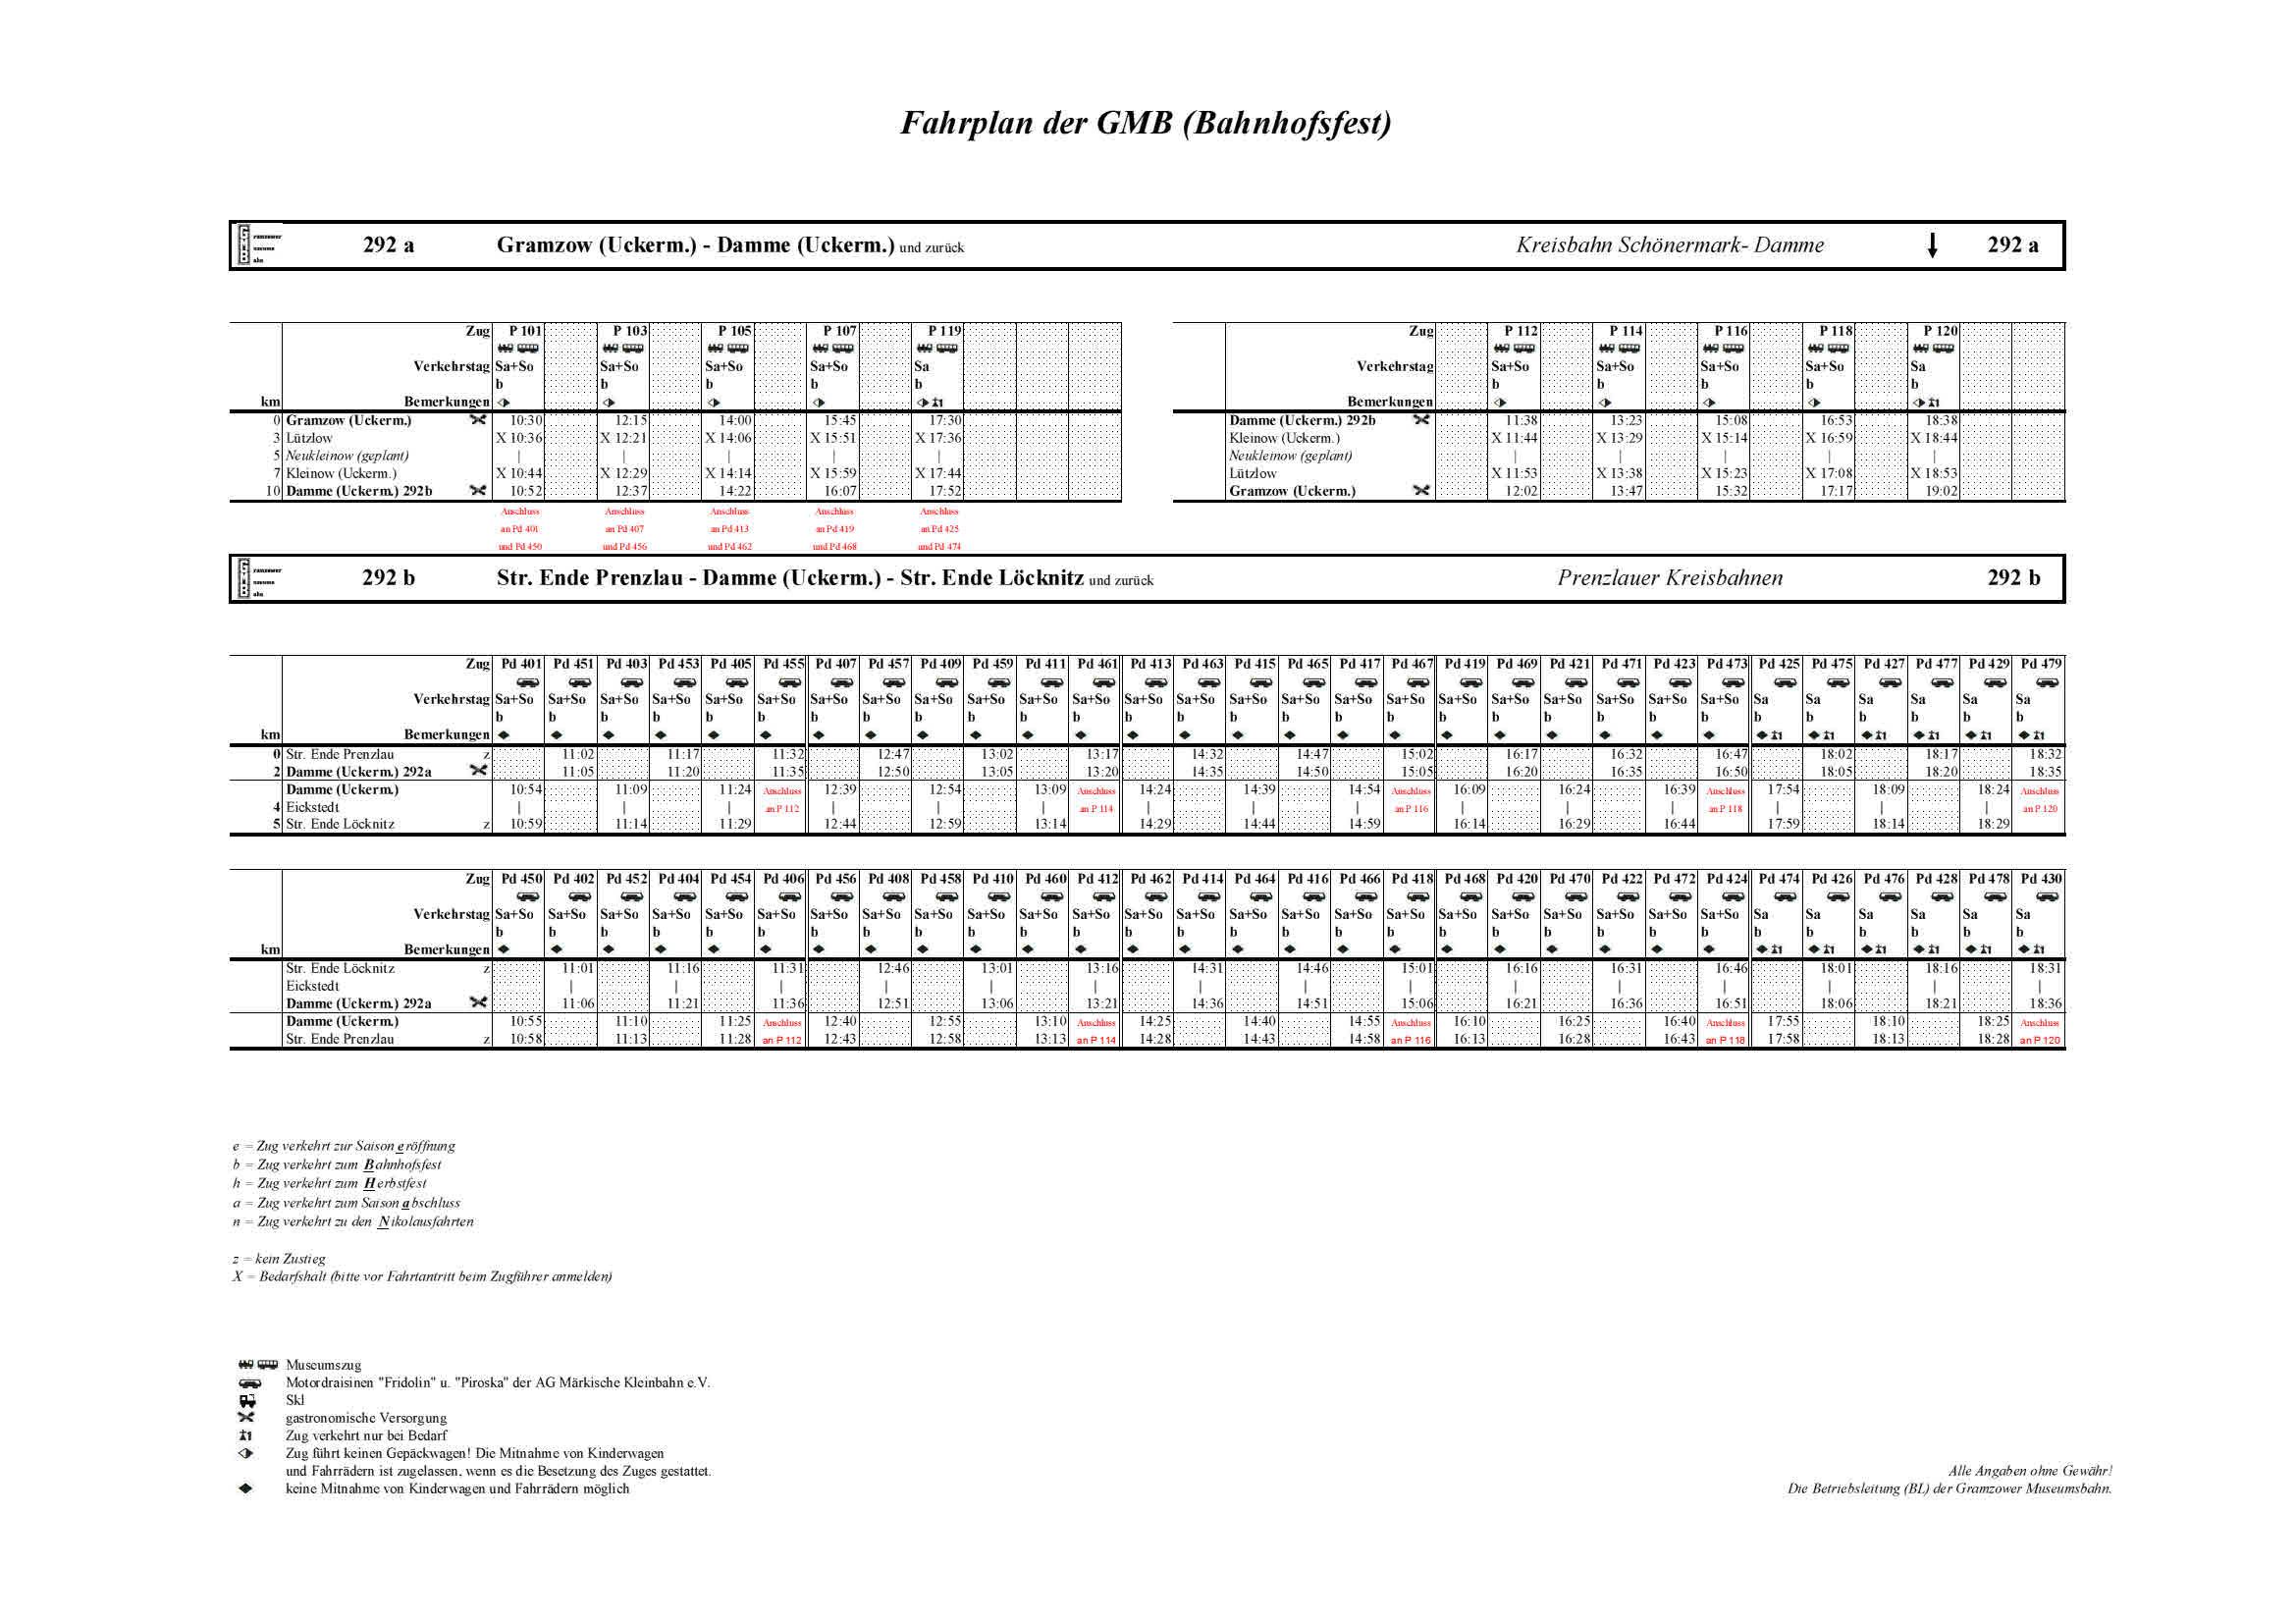 Fahrplan GMB (Bahnhofsfest) KBS 292 a,b